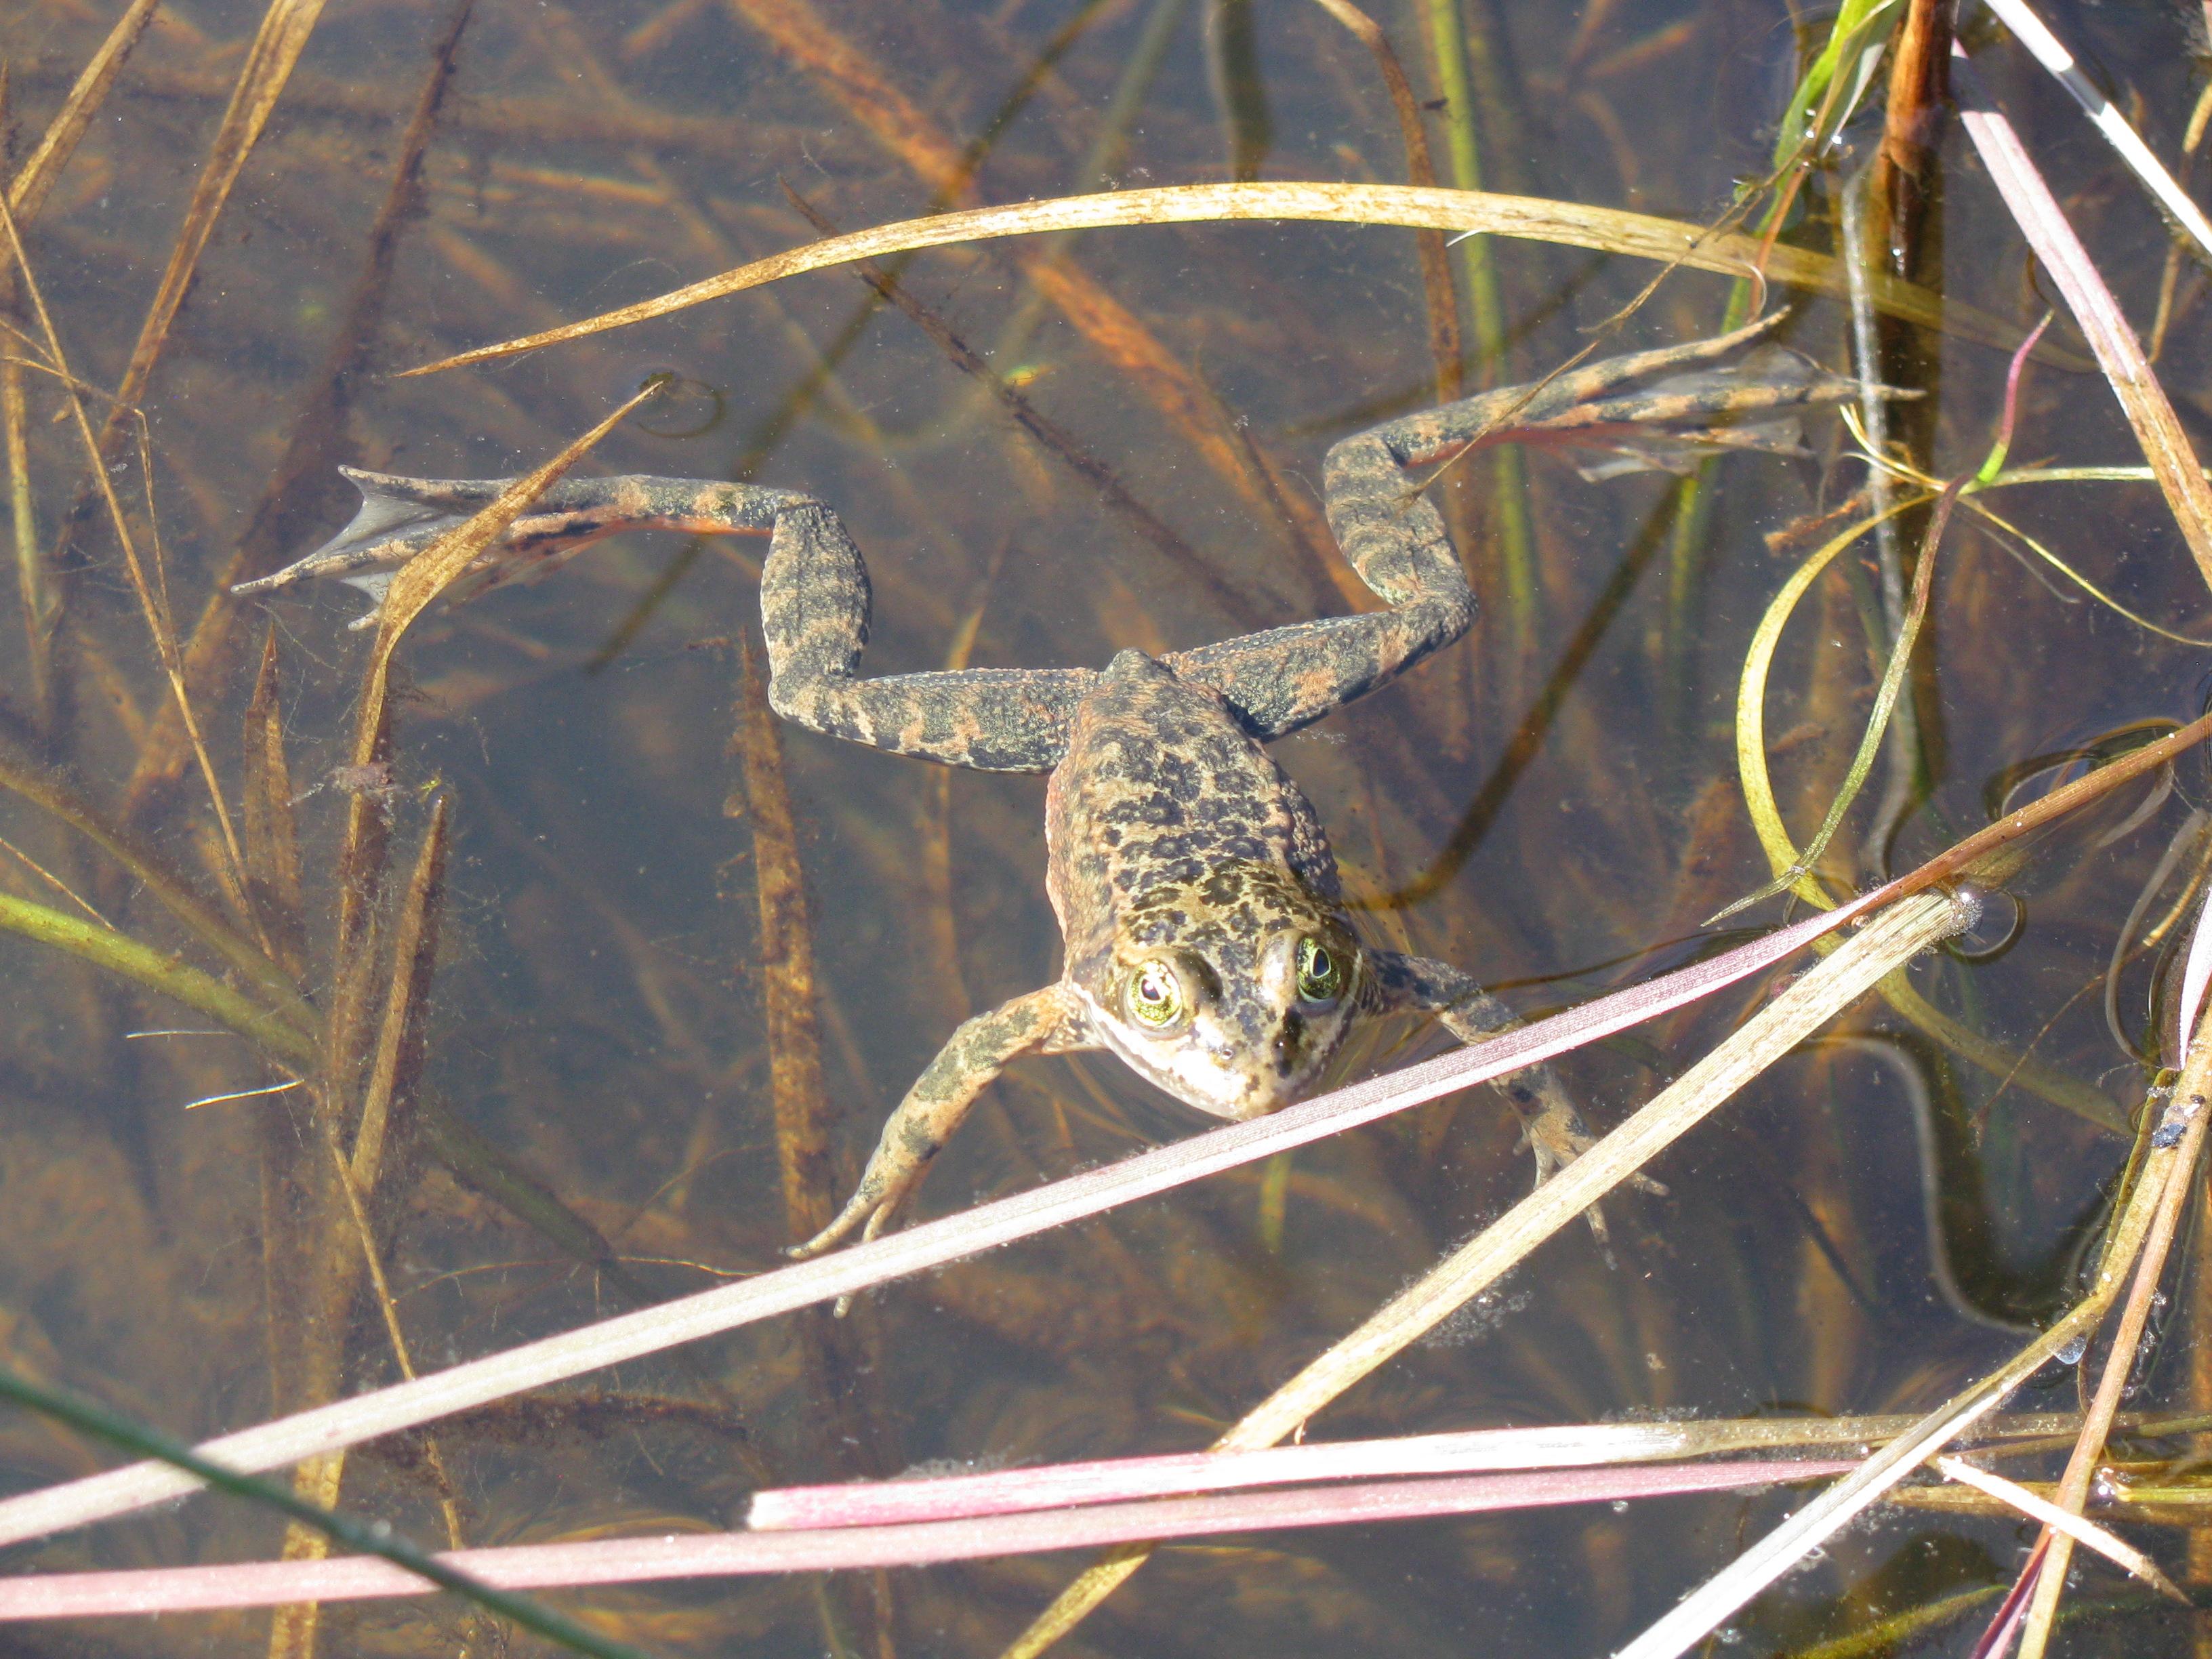 oregon_spotted_frog_rana_pretiosa_8895523540